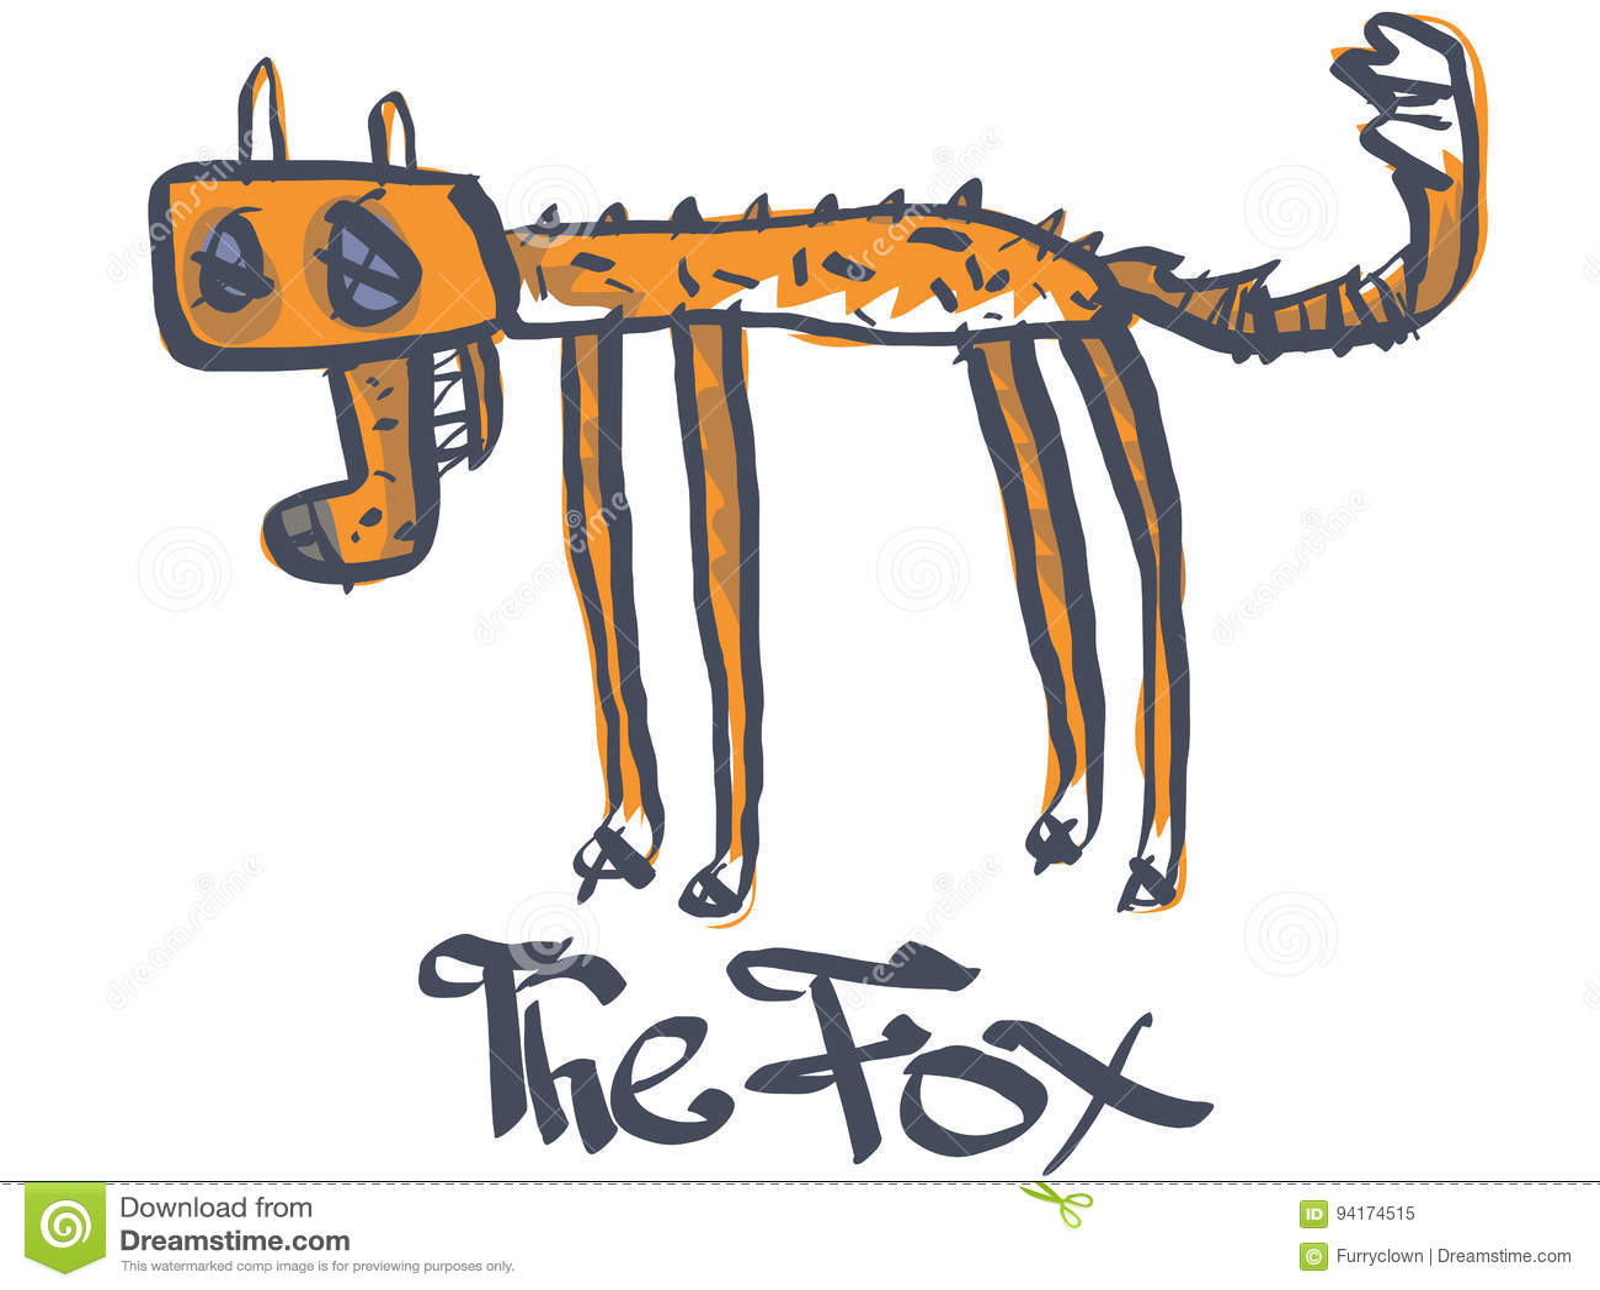 A dead fox stock vector  Illustration of tail, humor - 94174515